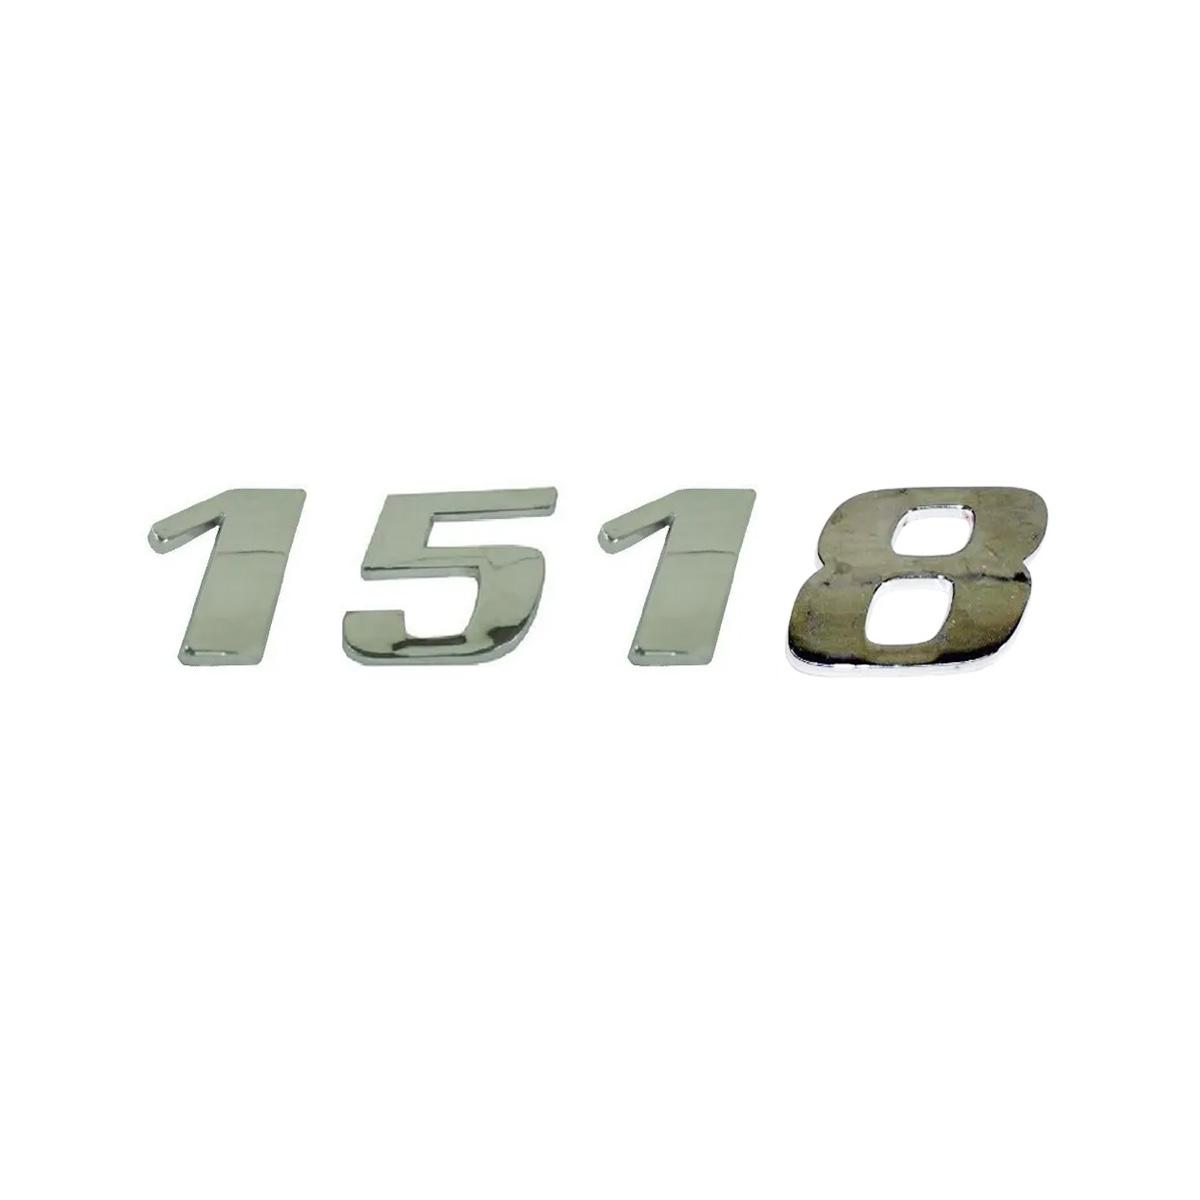 Emblema Mb Atego 1518 Cromado